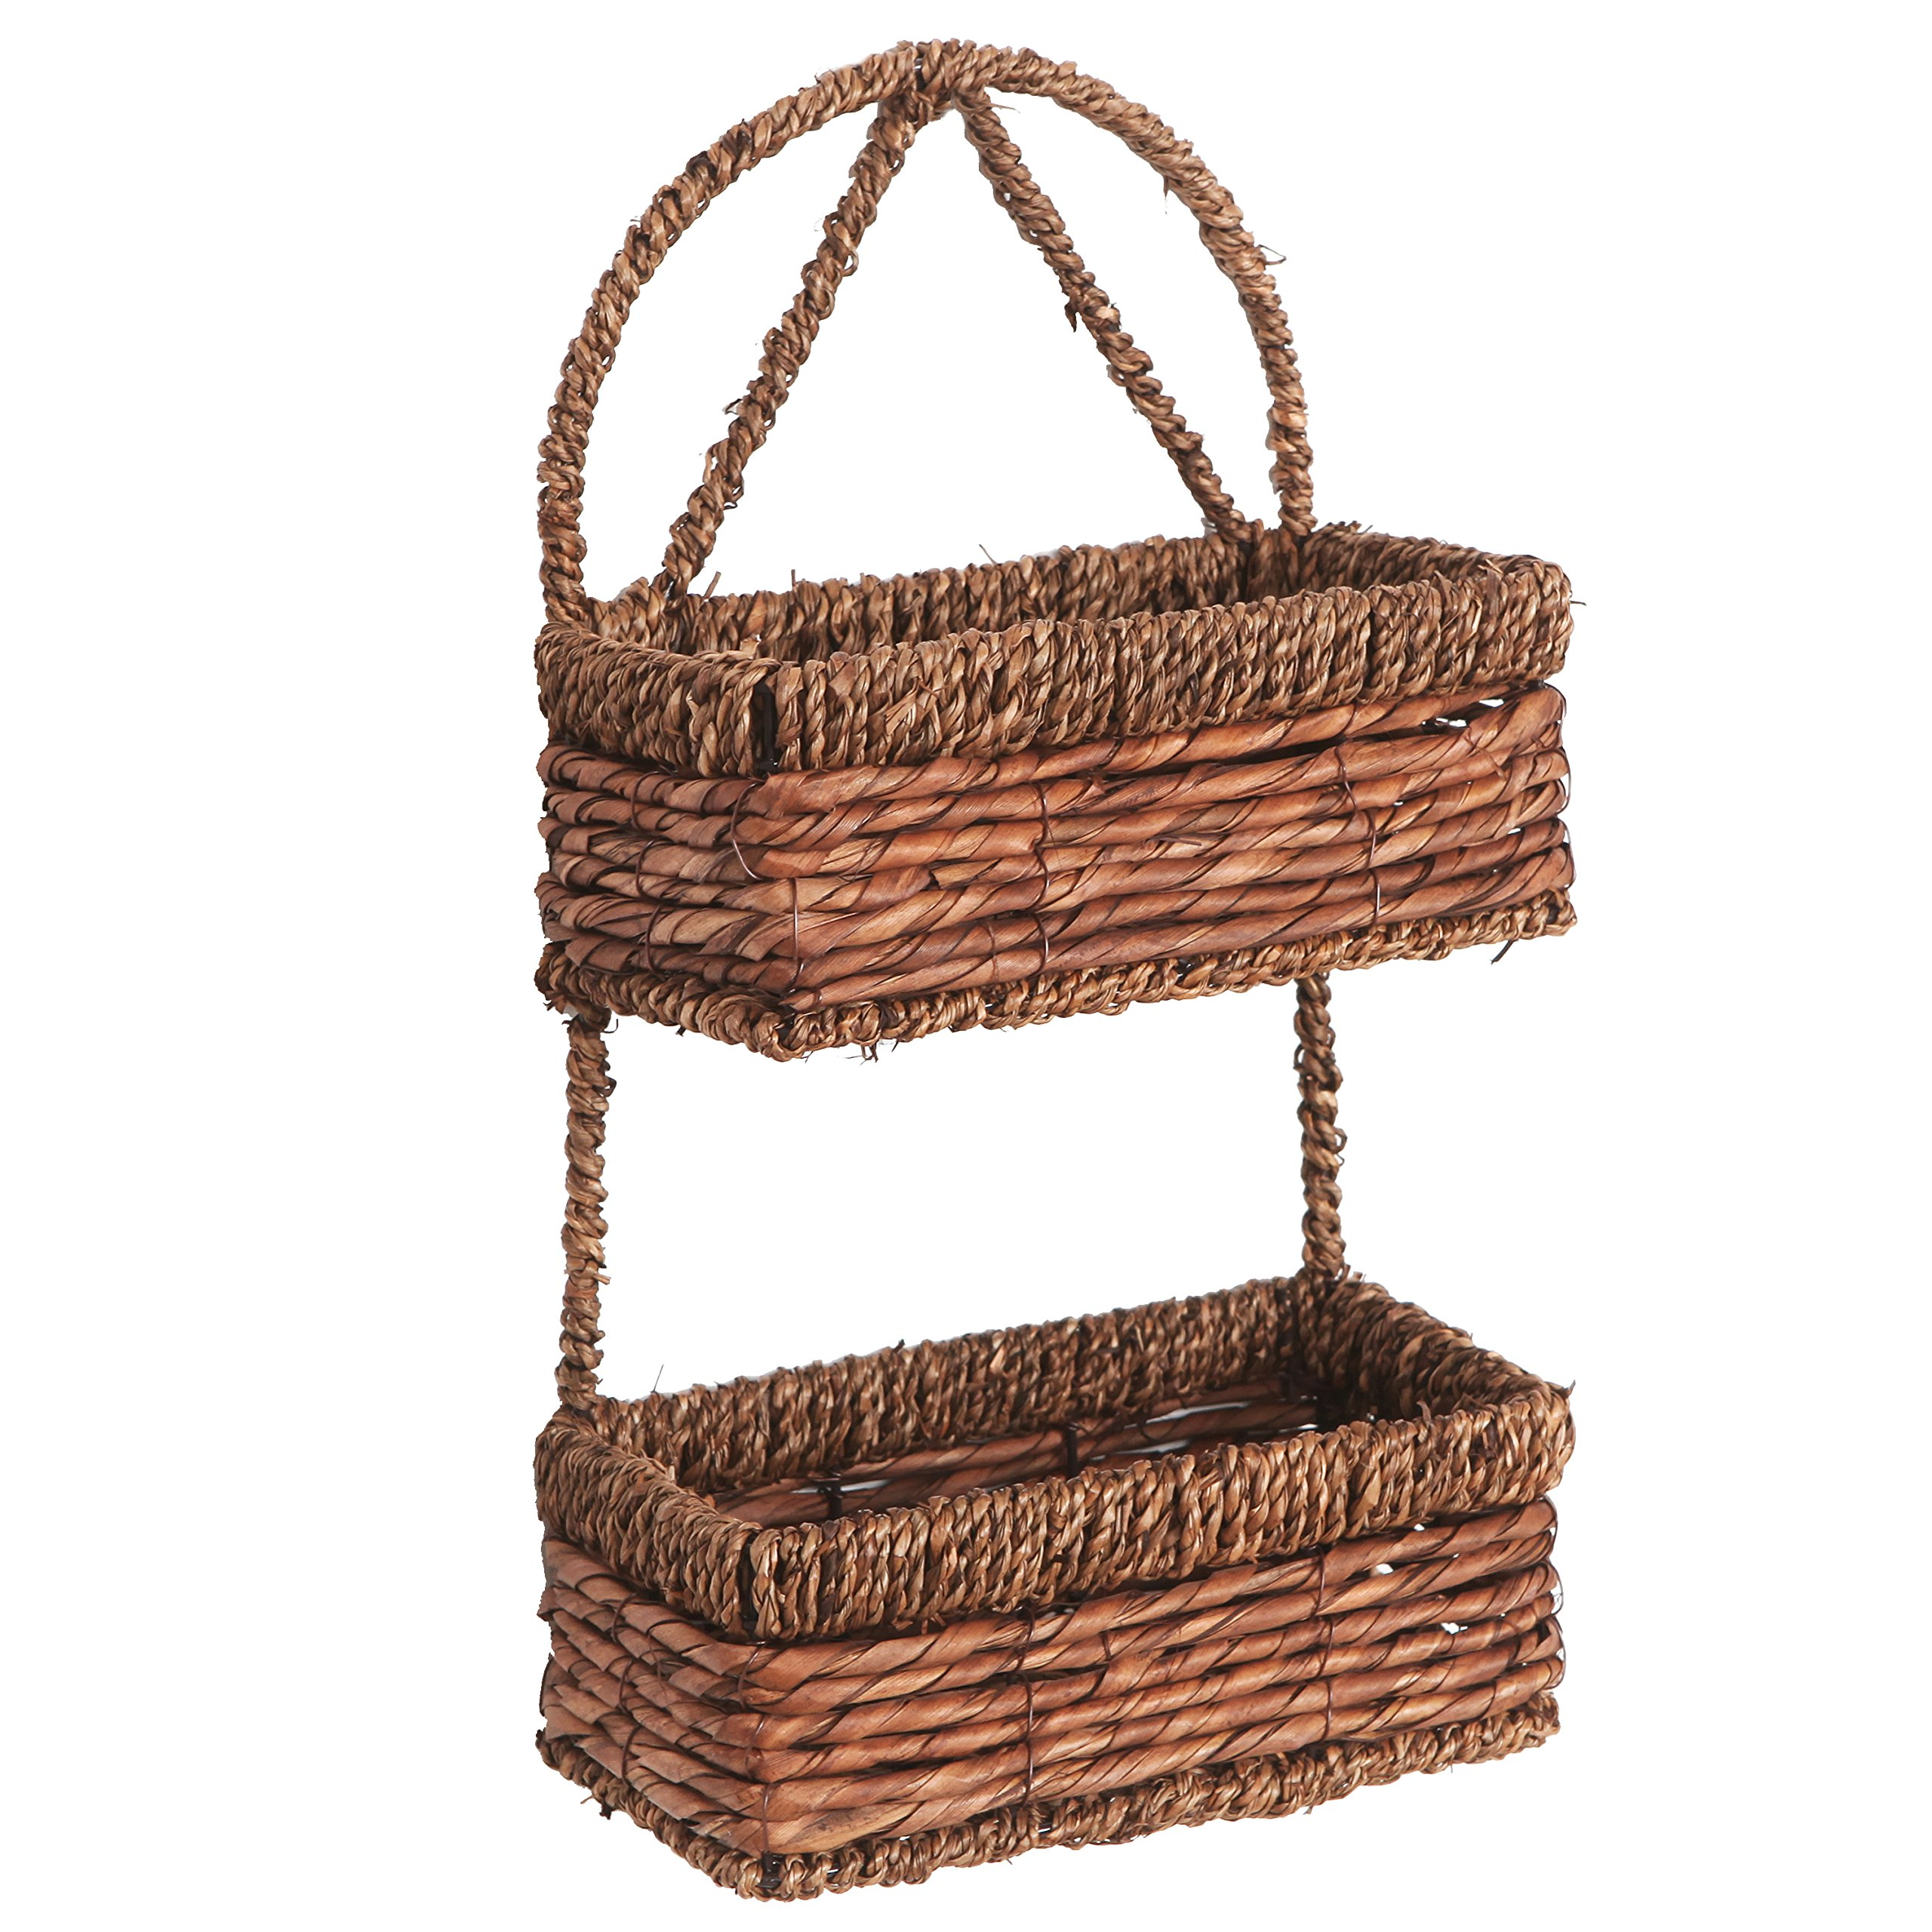 hanging baskets for bathroom amazon com rh amazon com  hanging baskets for bathroom towels